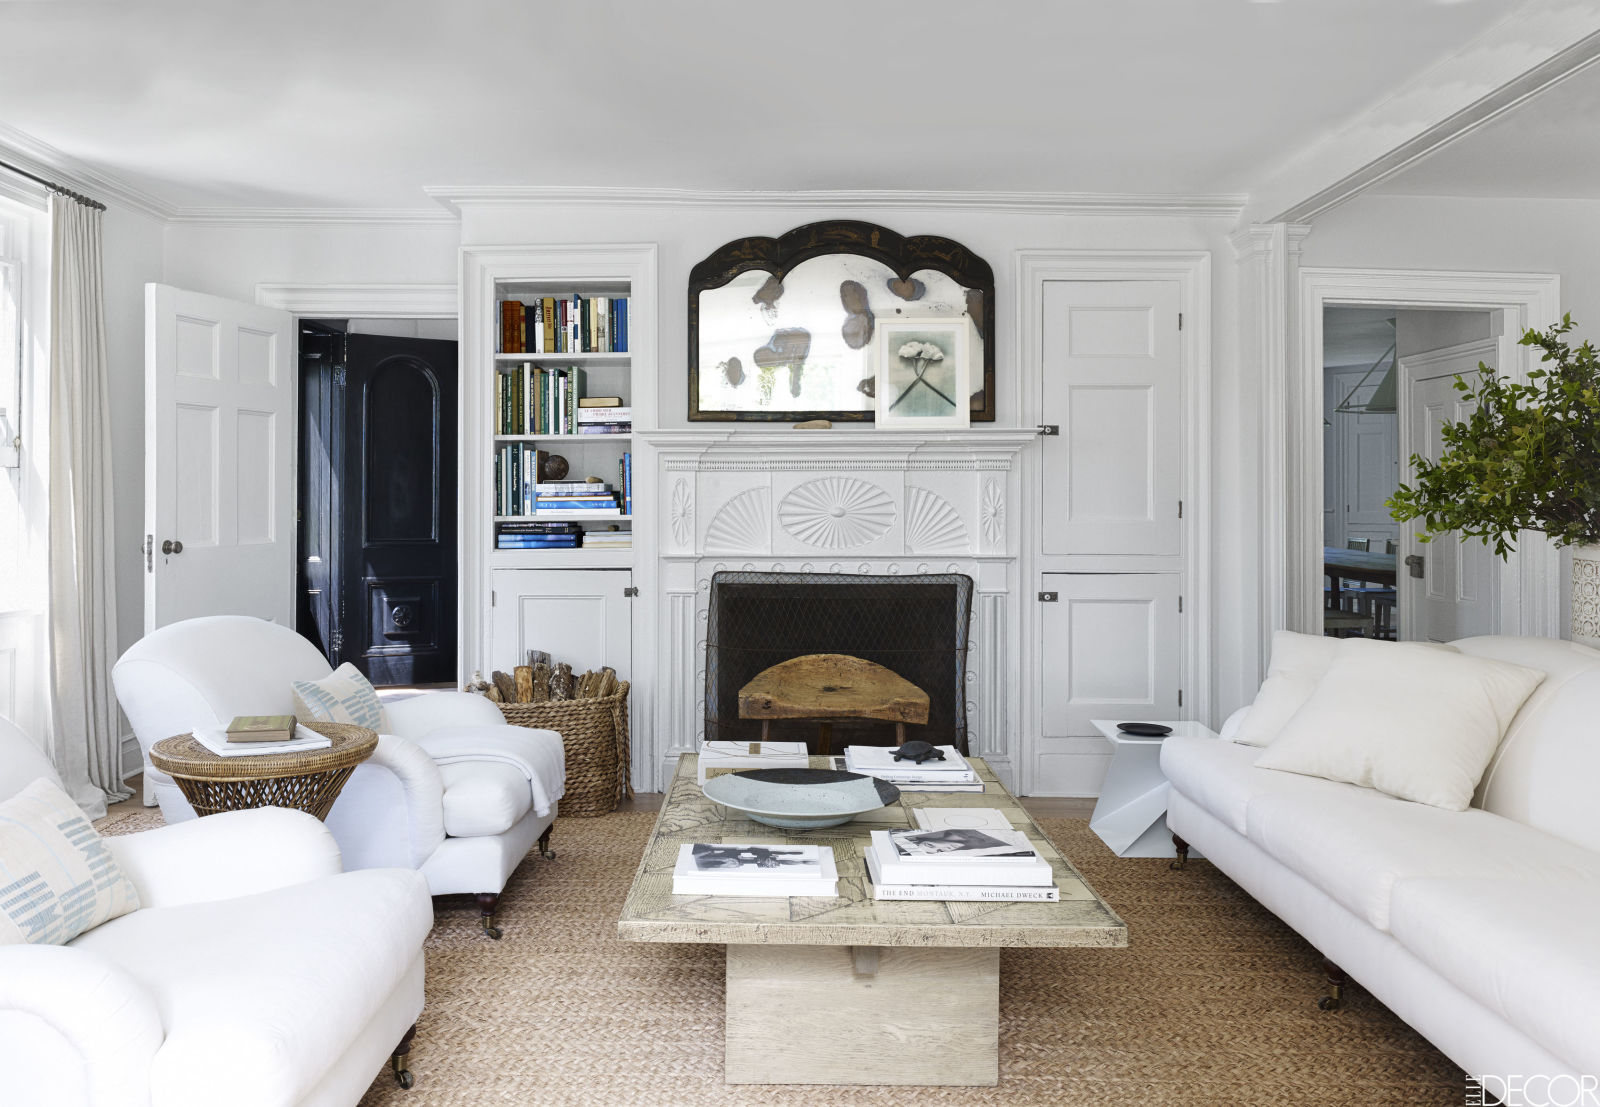 Living Room Room Ideas room decor ideas for design and decorating ideas